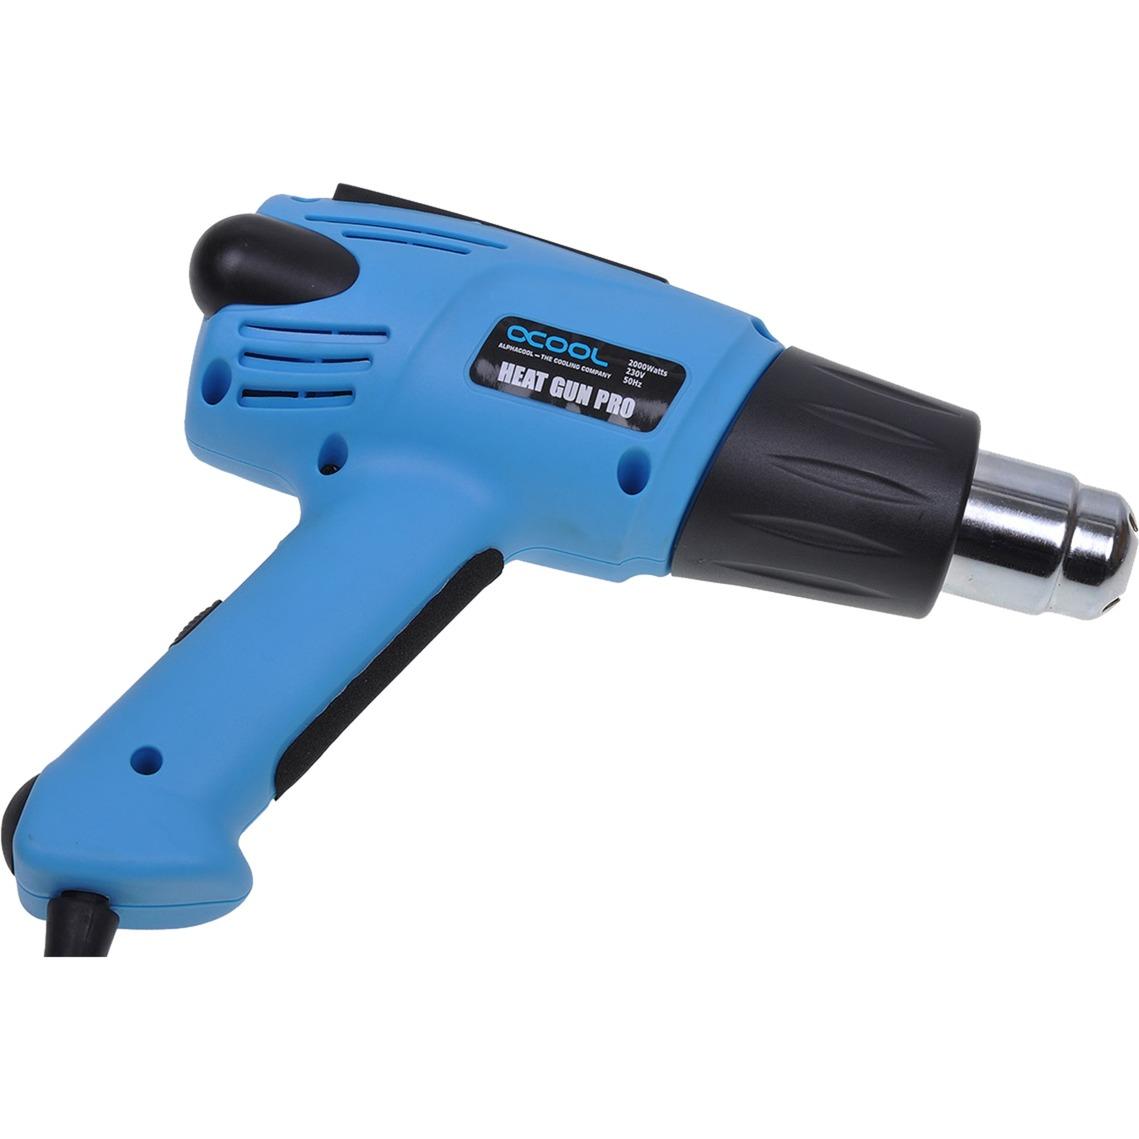 29111 pistola de calor 600 l/min Negro, Azul 2000 W, Decapador por aire caliente